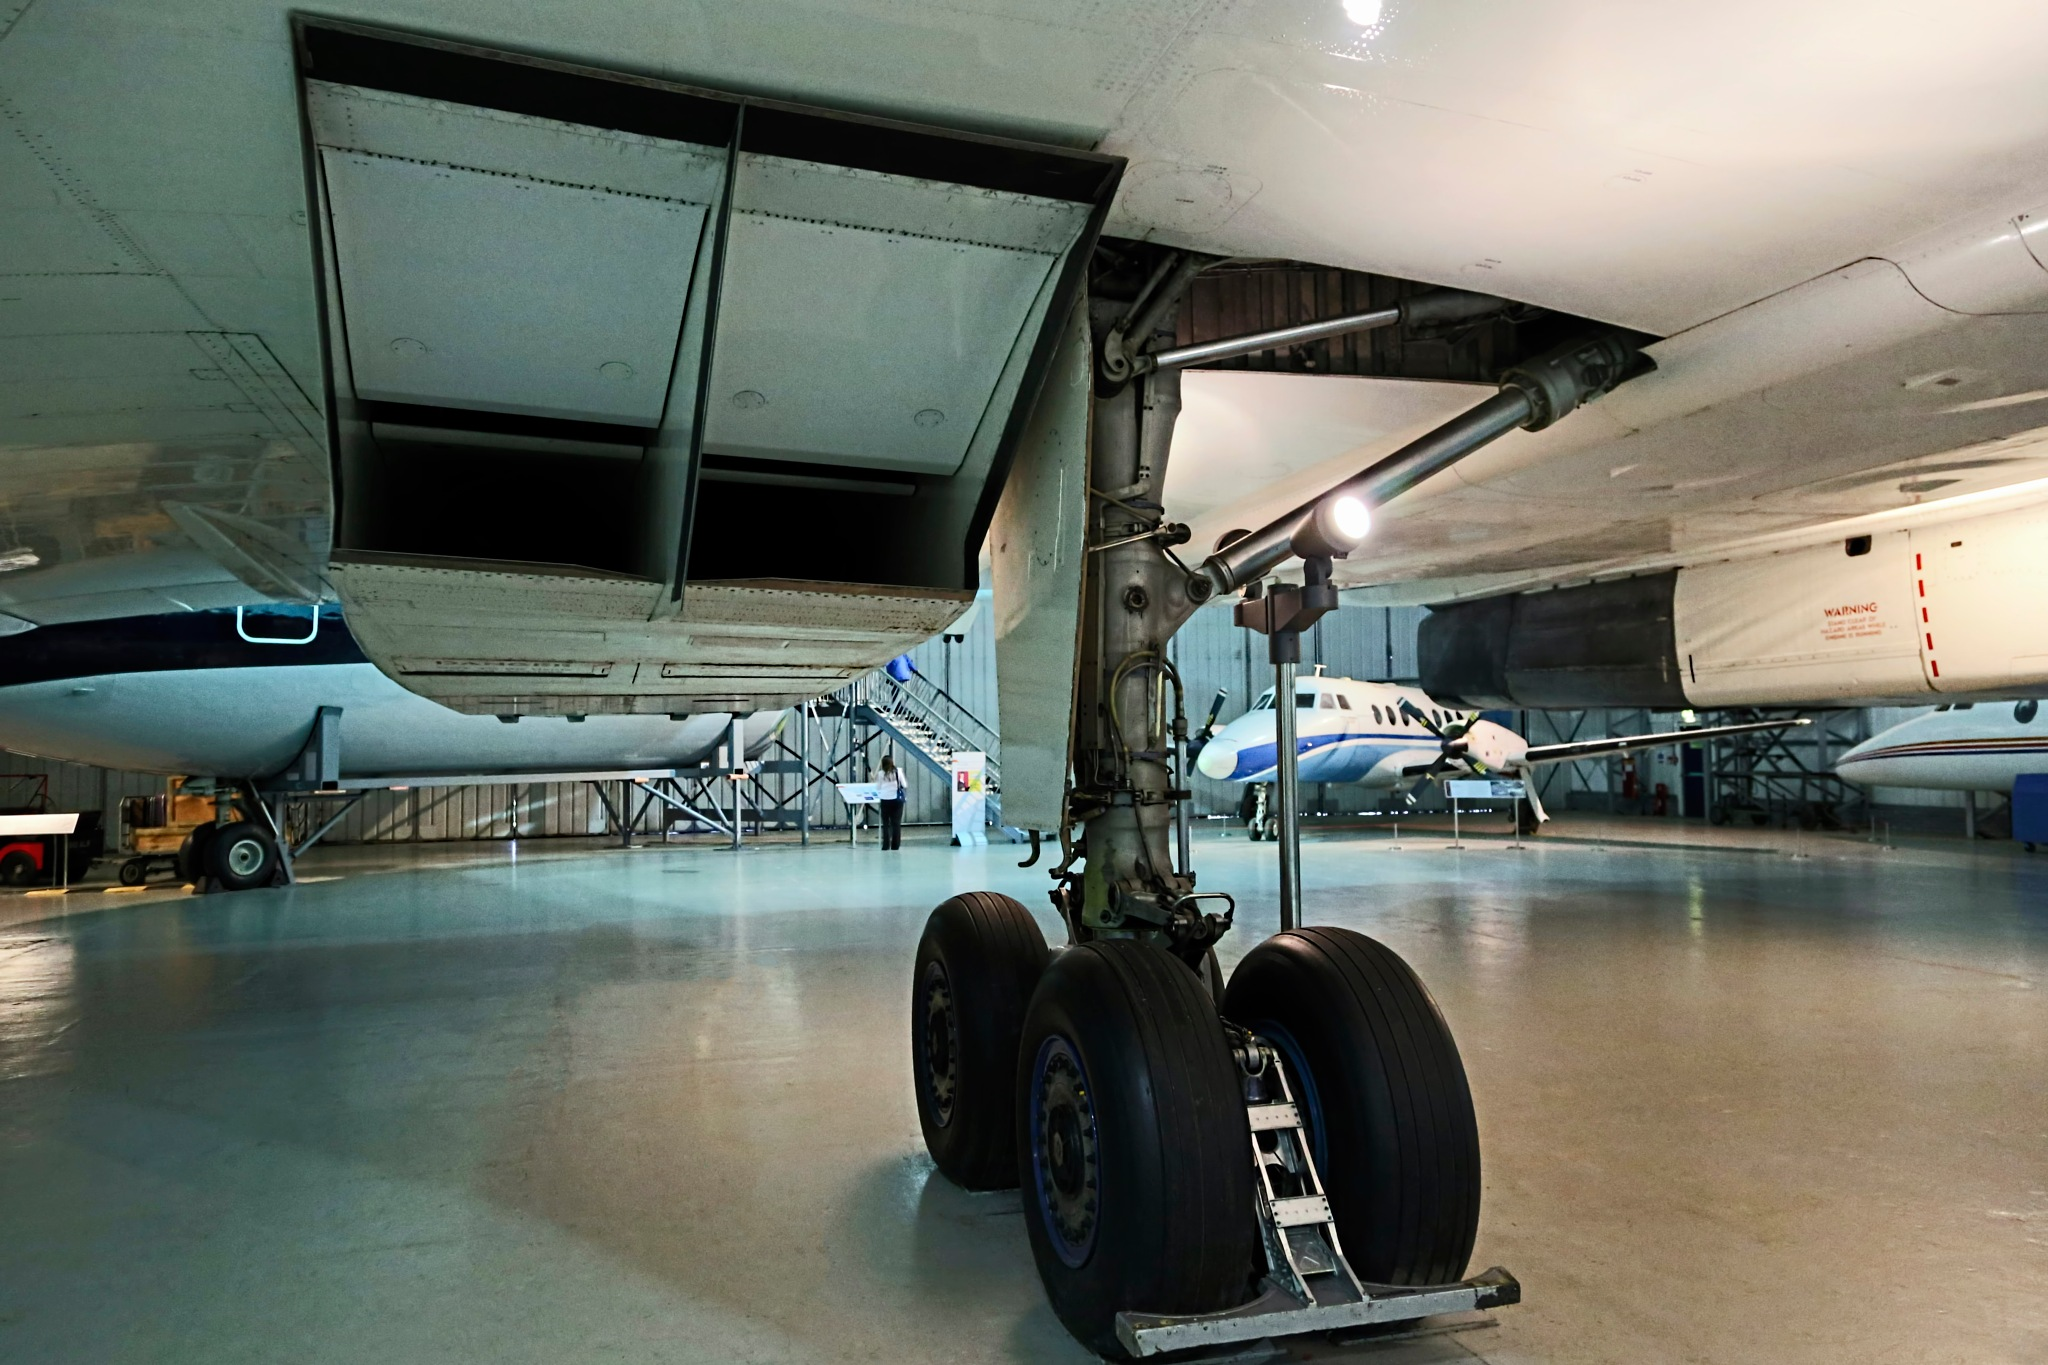 Concorde 5th by Peter Ellison